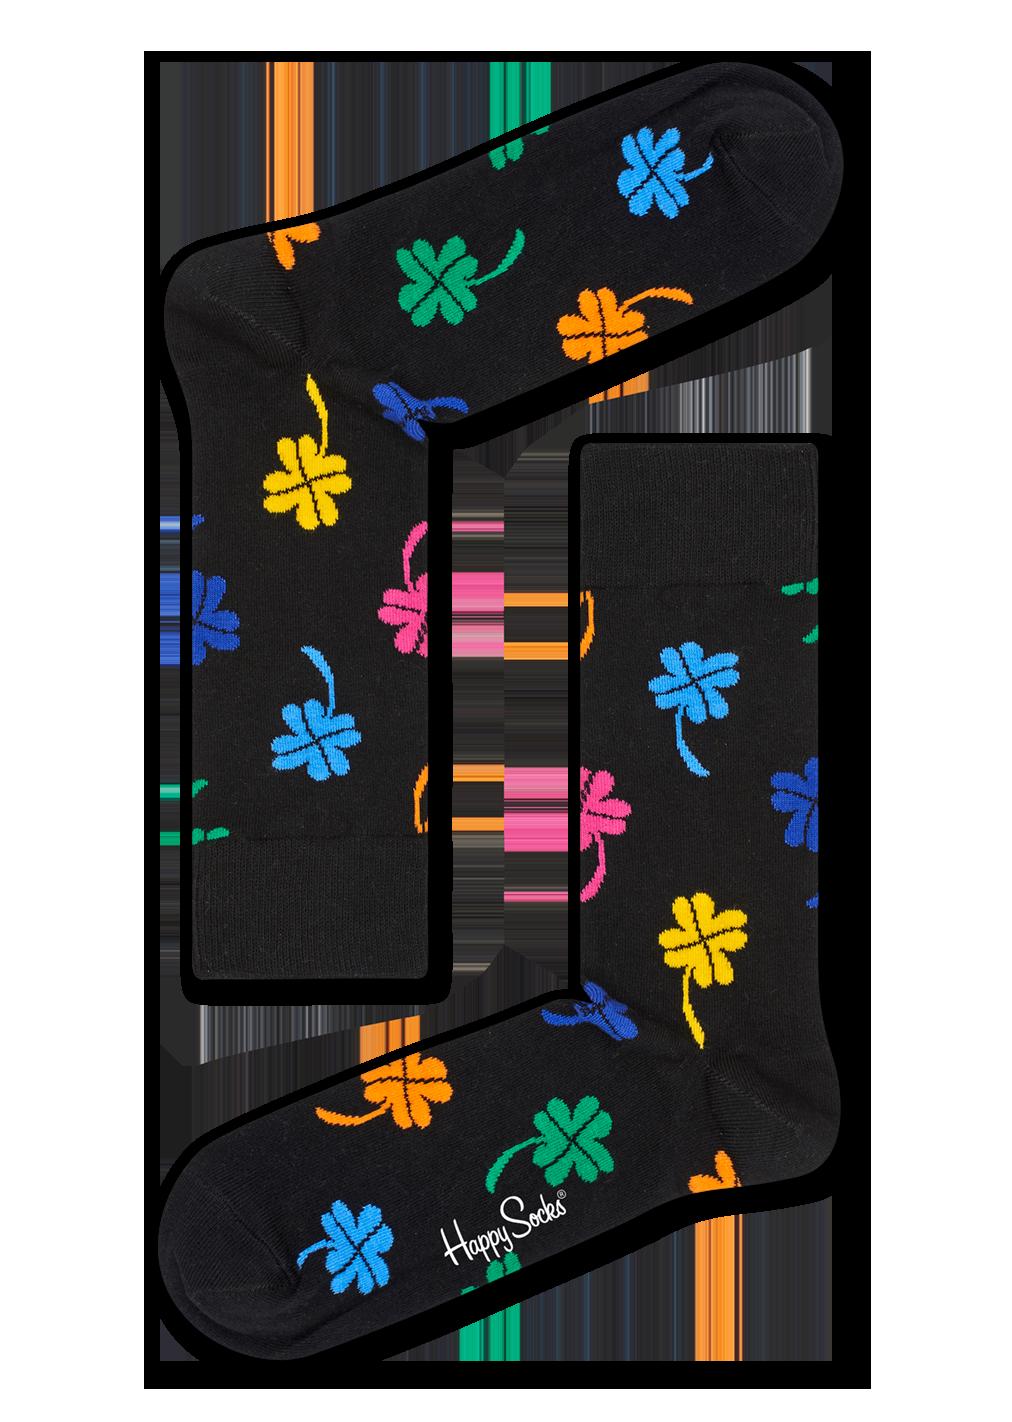 Big Luck Sock